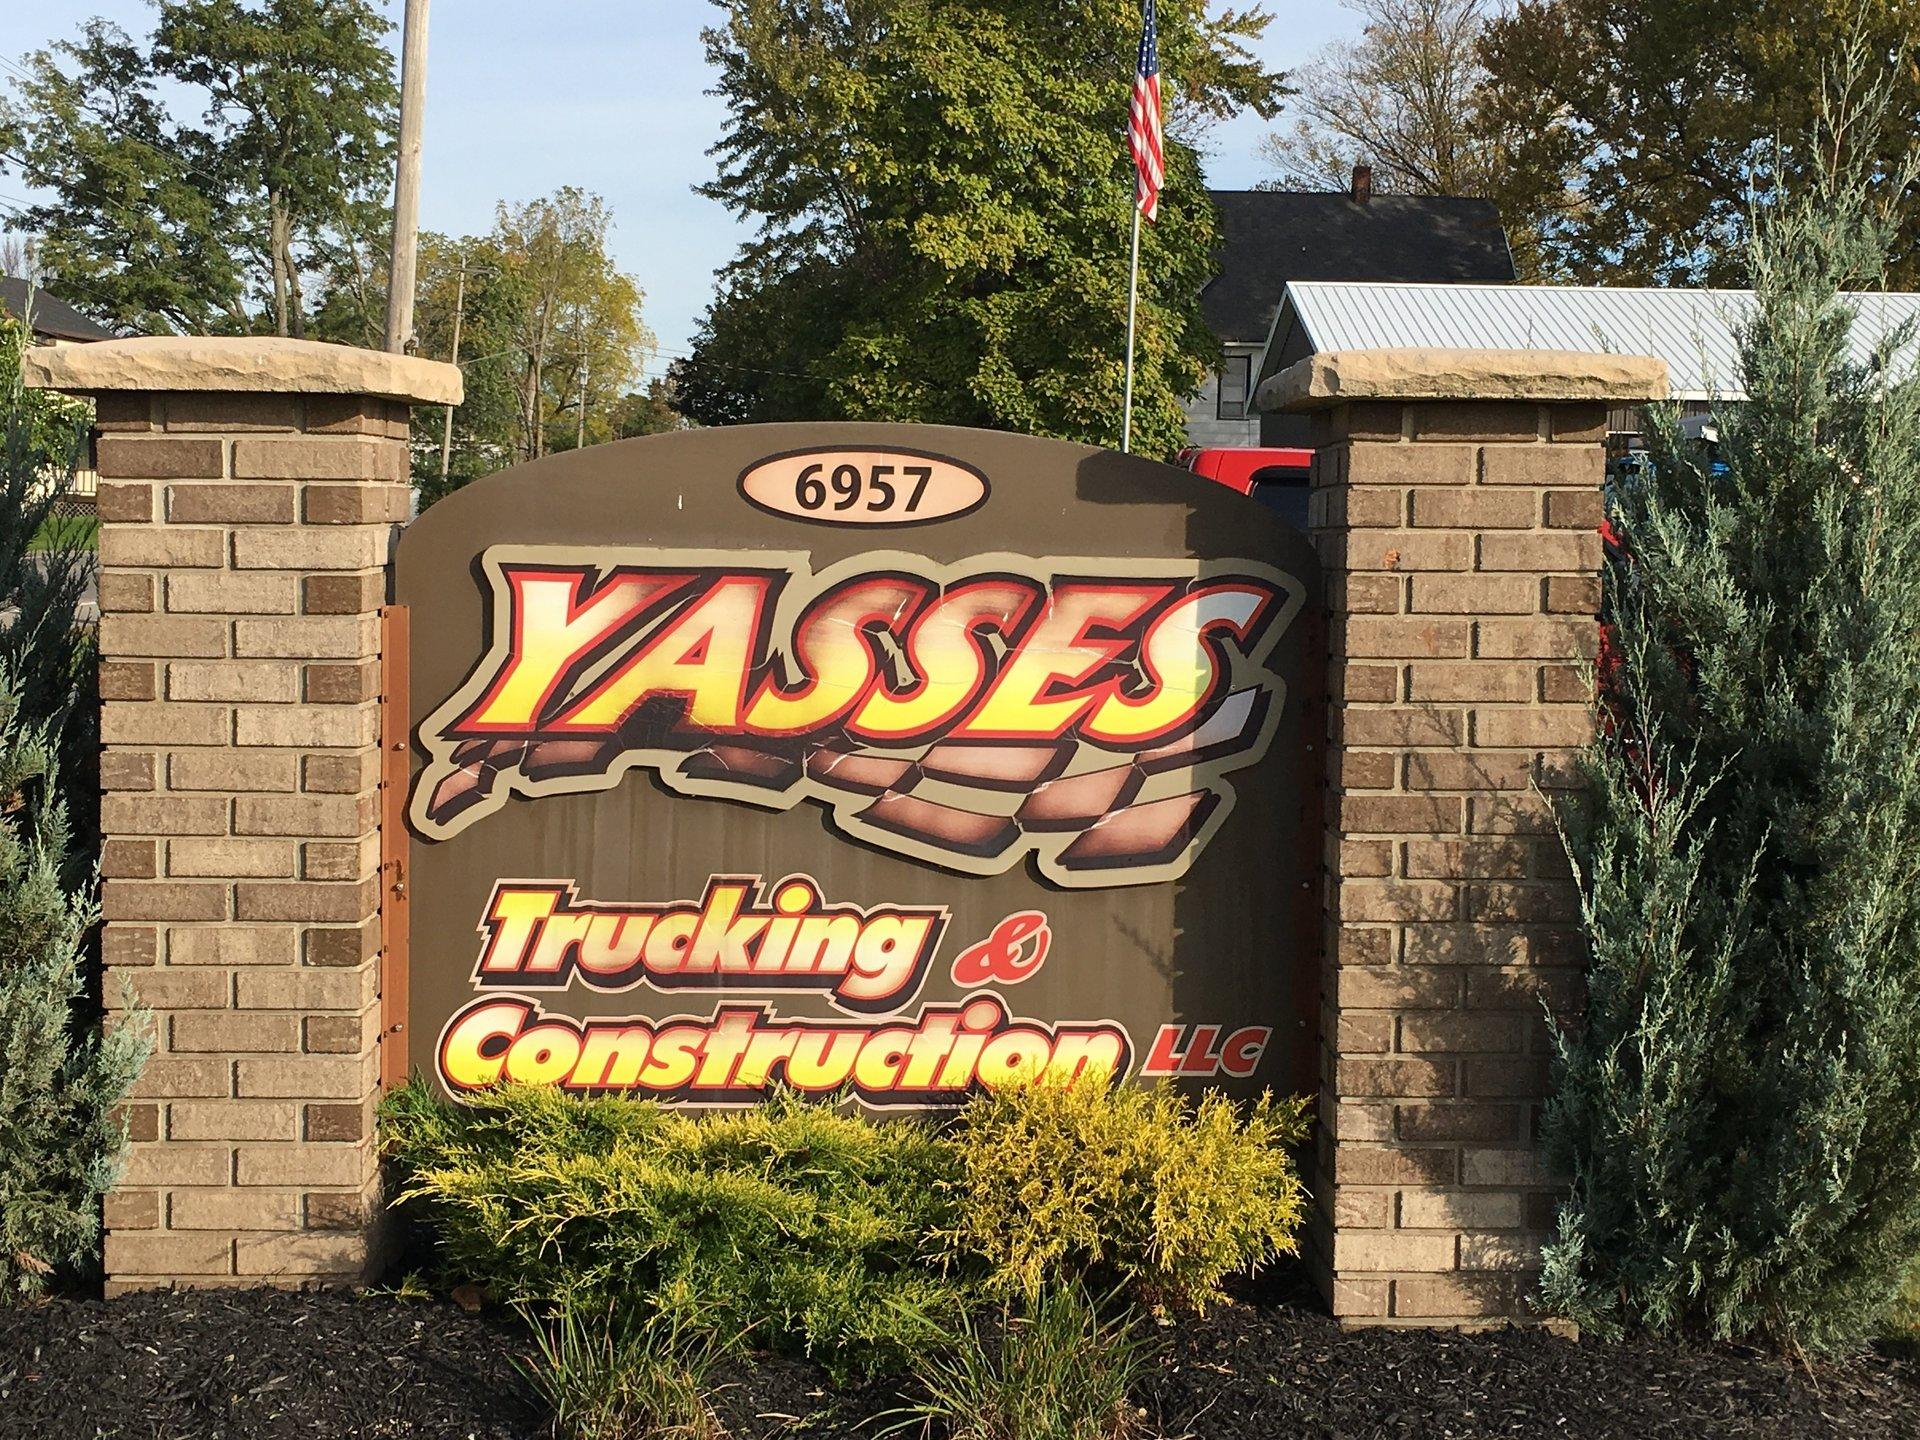 Yasses Trucking & Construction logo on a brick street sign